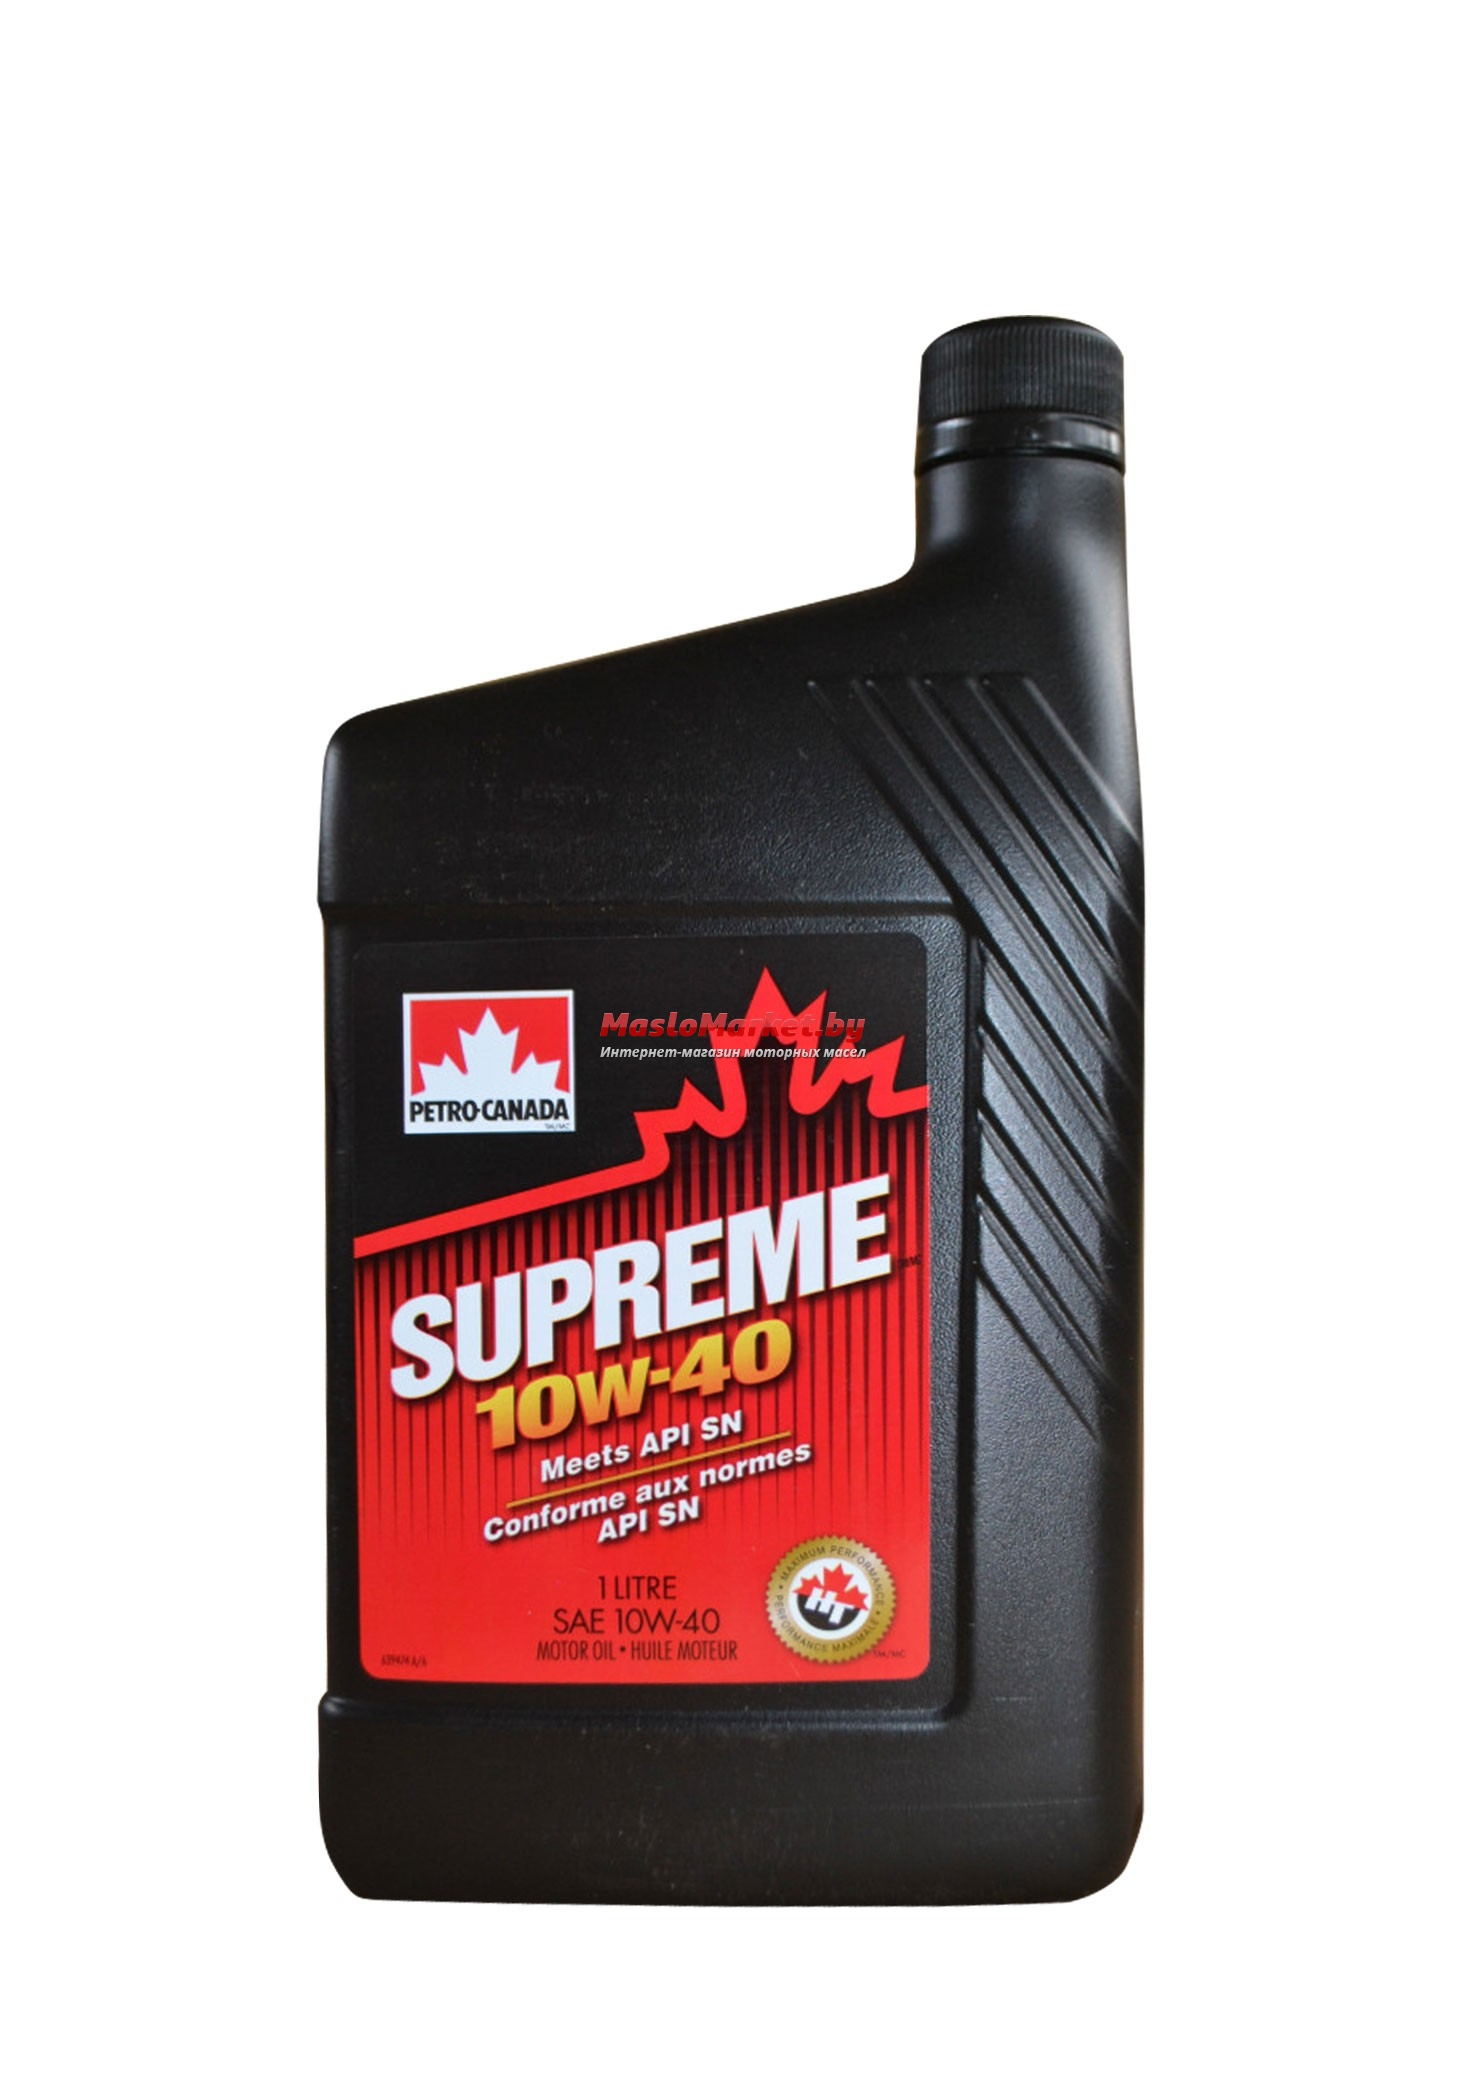 Масло петро канада отзывы